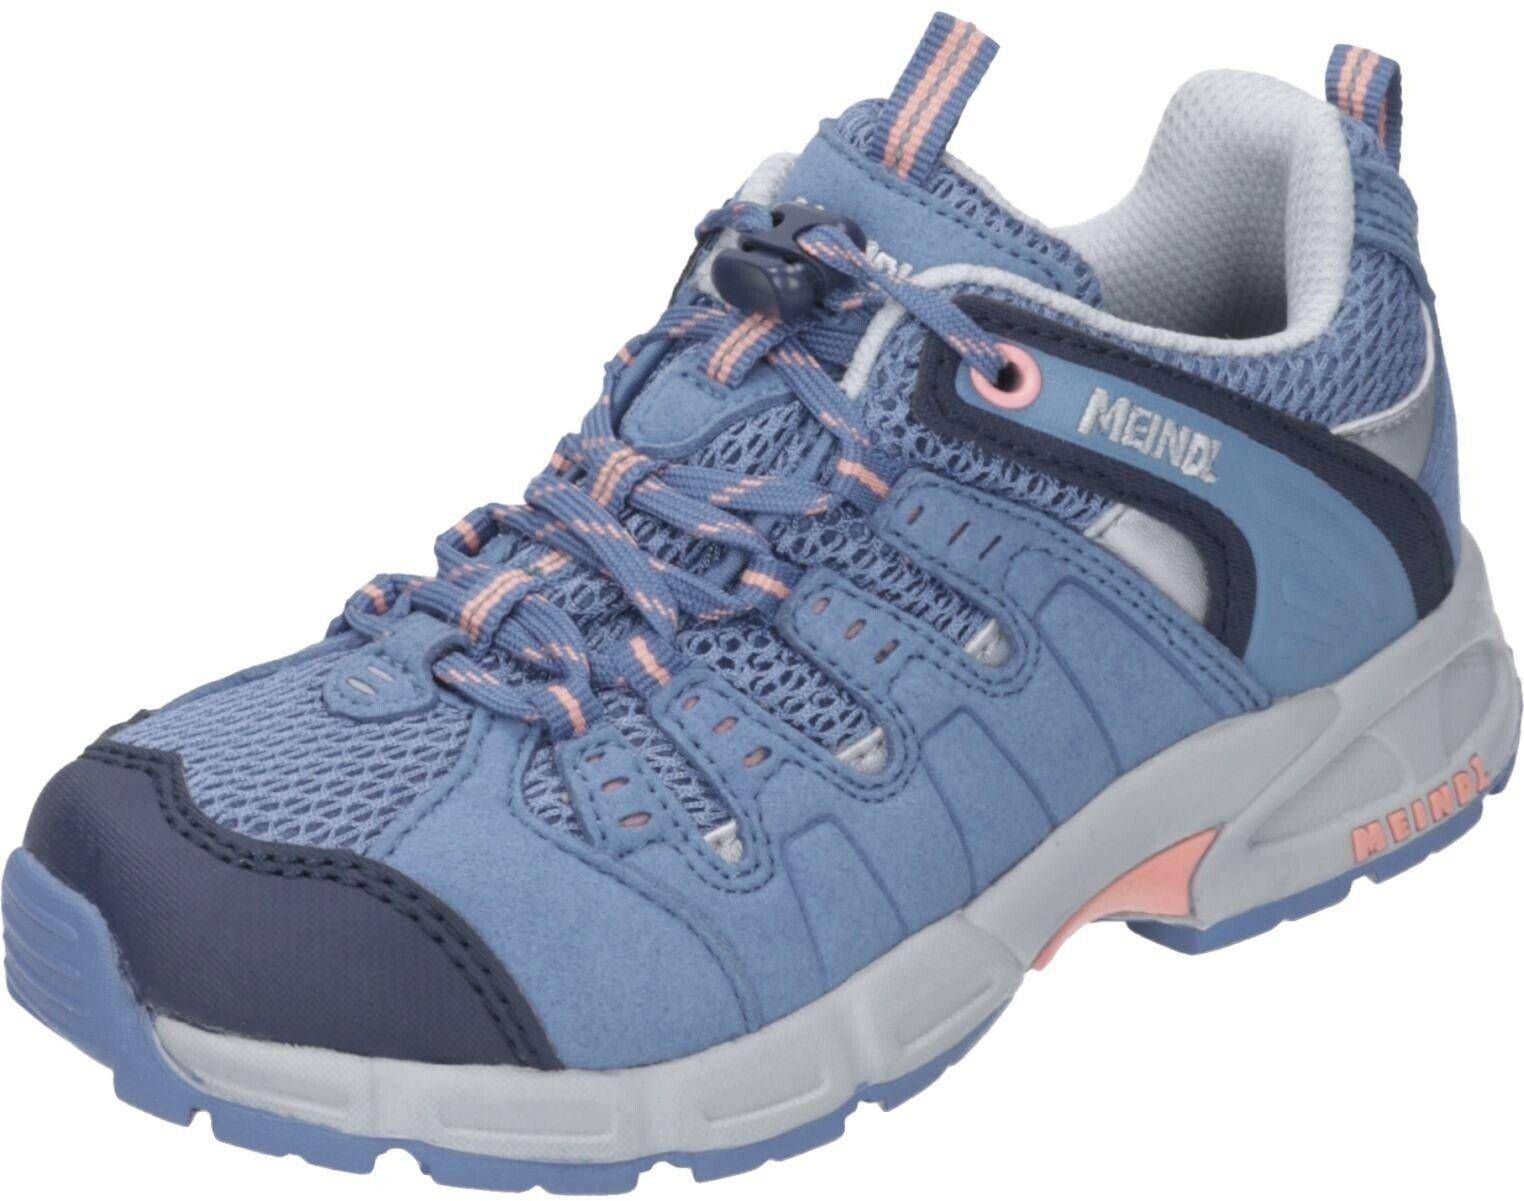 Meindl-Kinder Kinder Schuhe Respond Junior lilat Veloursleder NEU    | Günstige